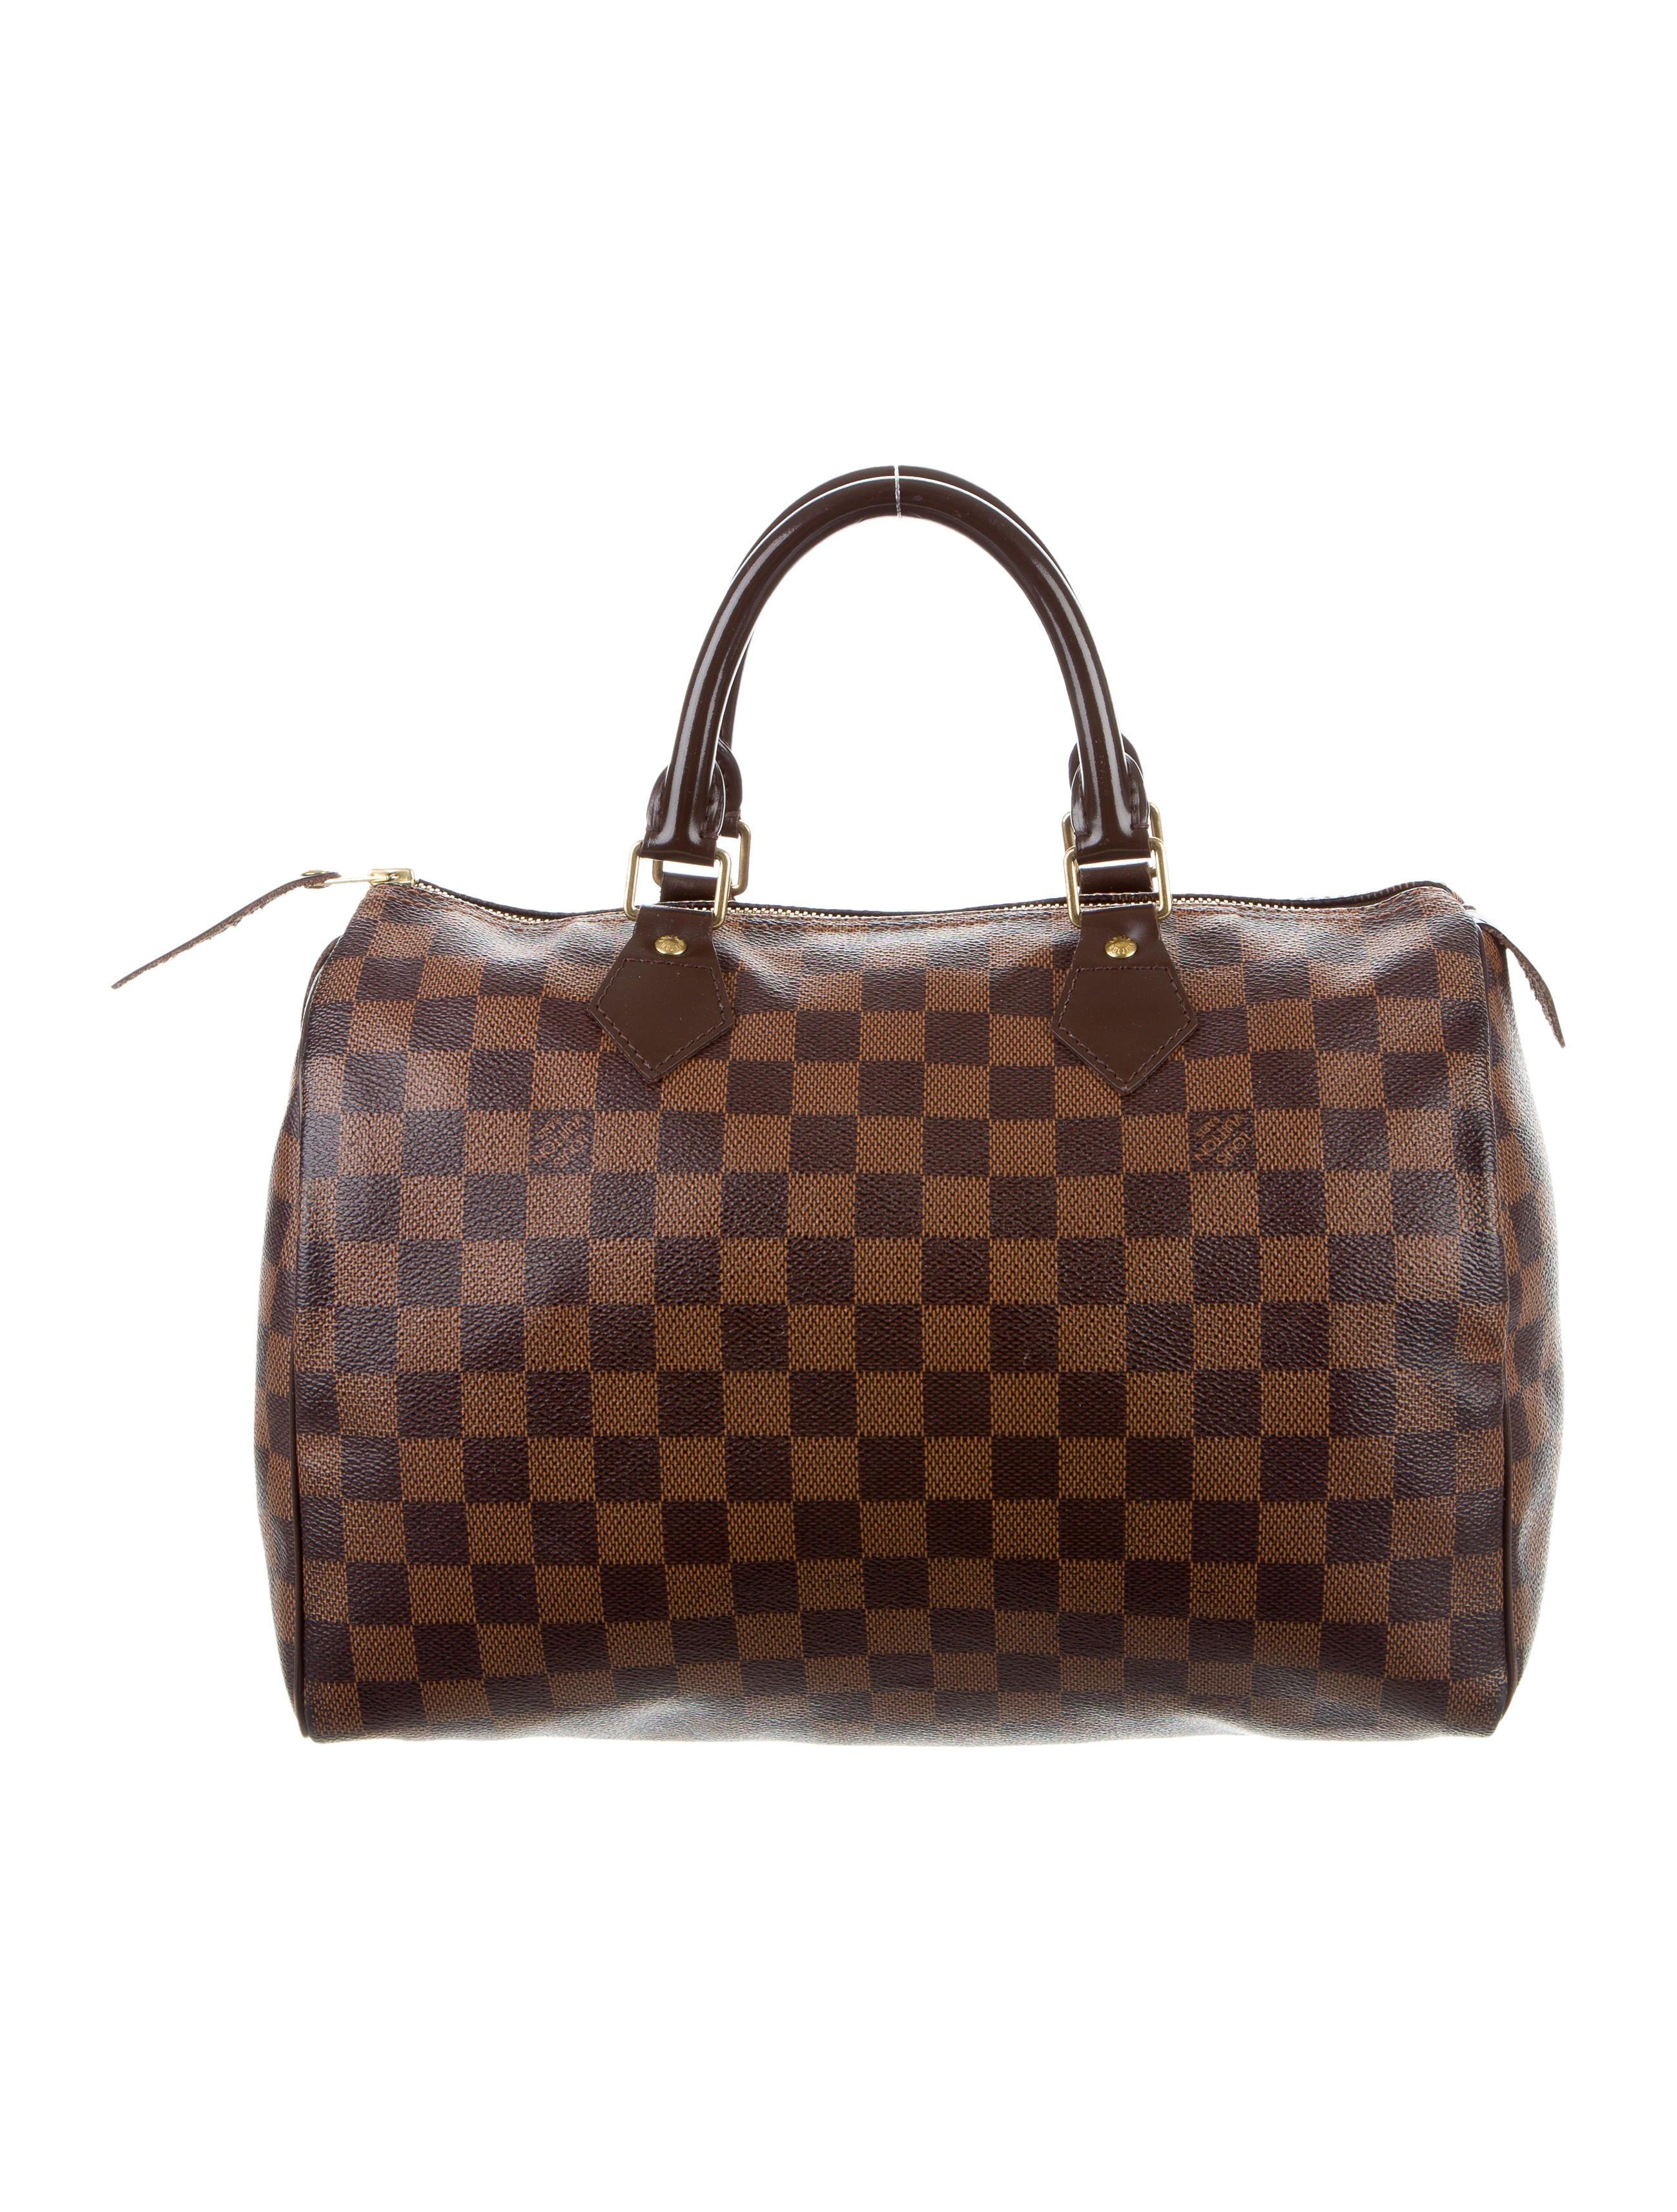 louis vuitton damier speedy 30 handbags lou108646. Black Bedroom Furniture Sets. Home Design Ideas